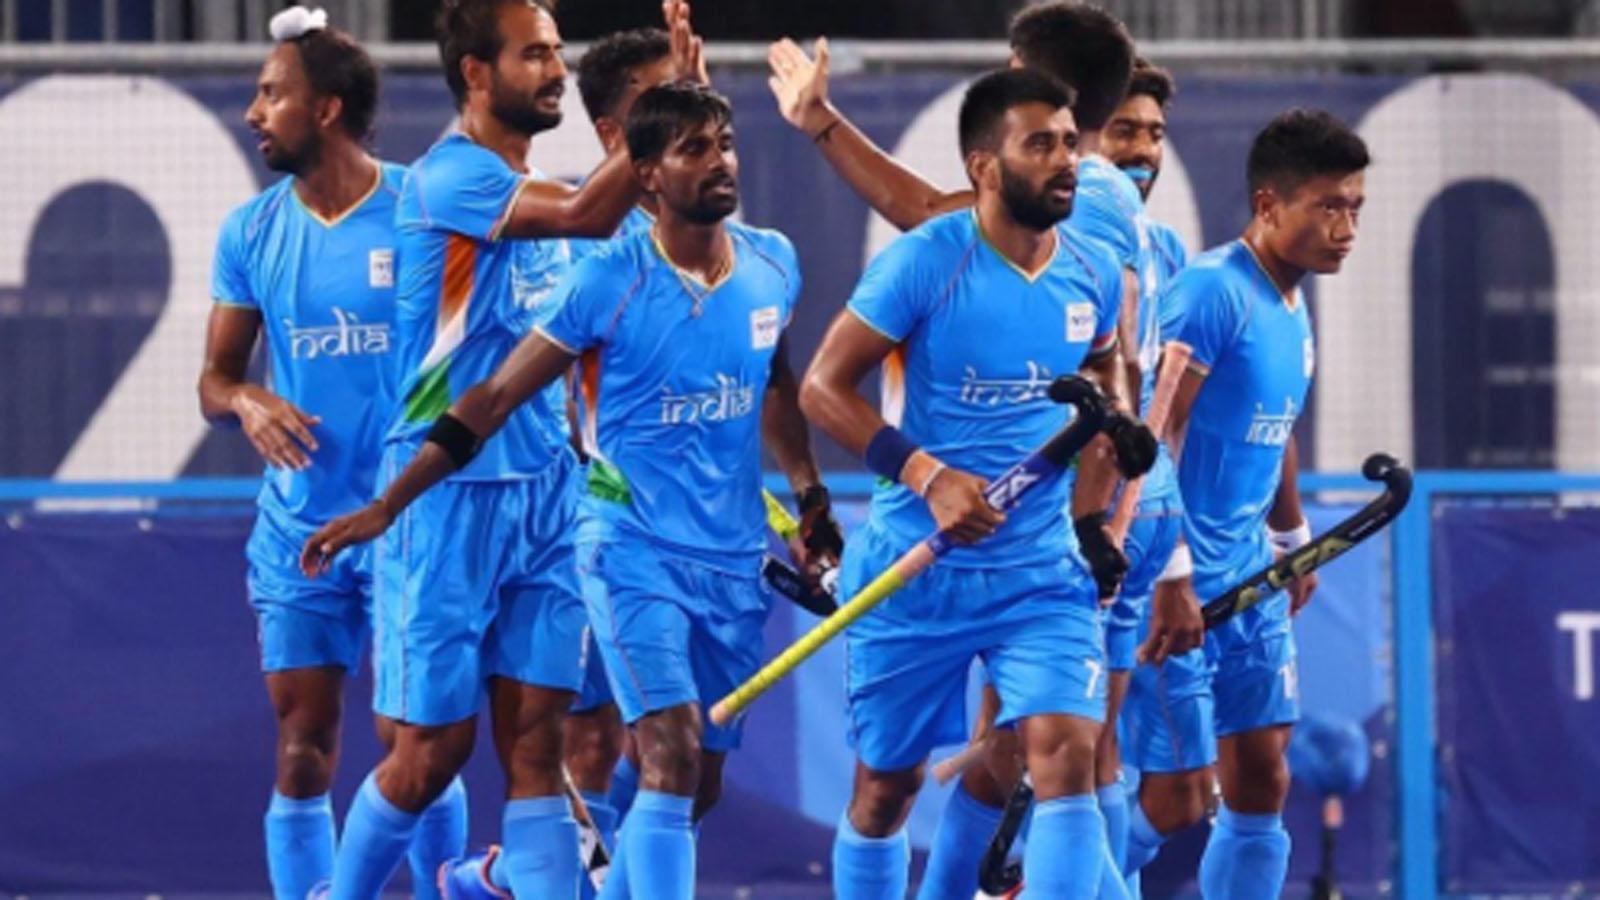 tokyo-olympics-2020-india-lose-to-belgium-in-semi-finals